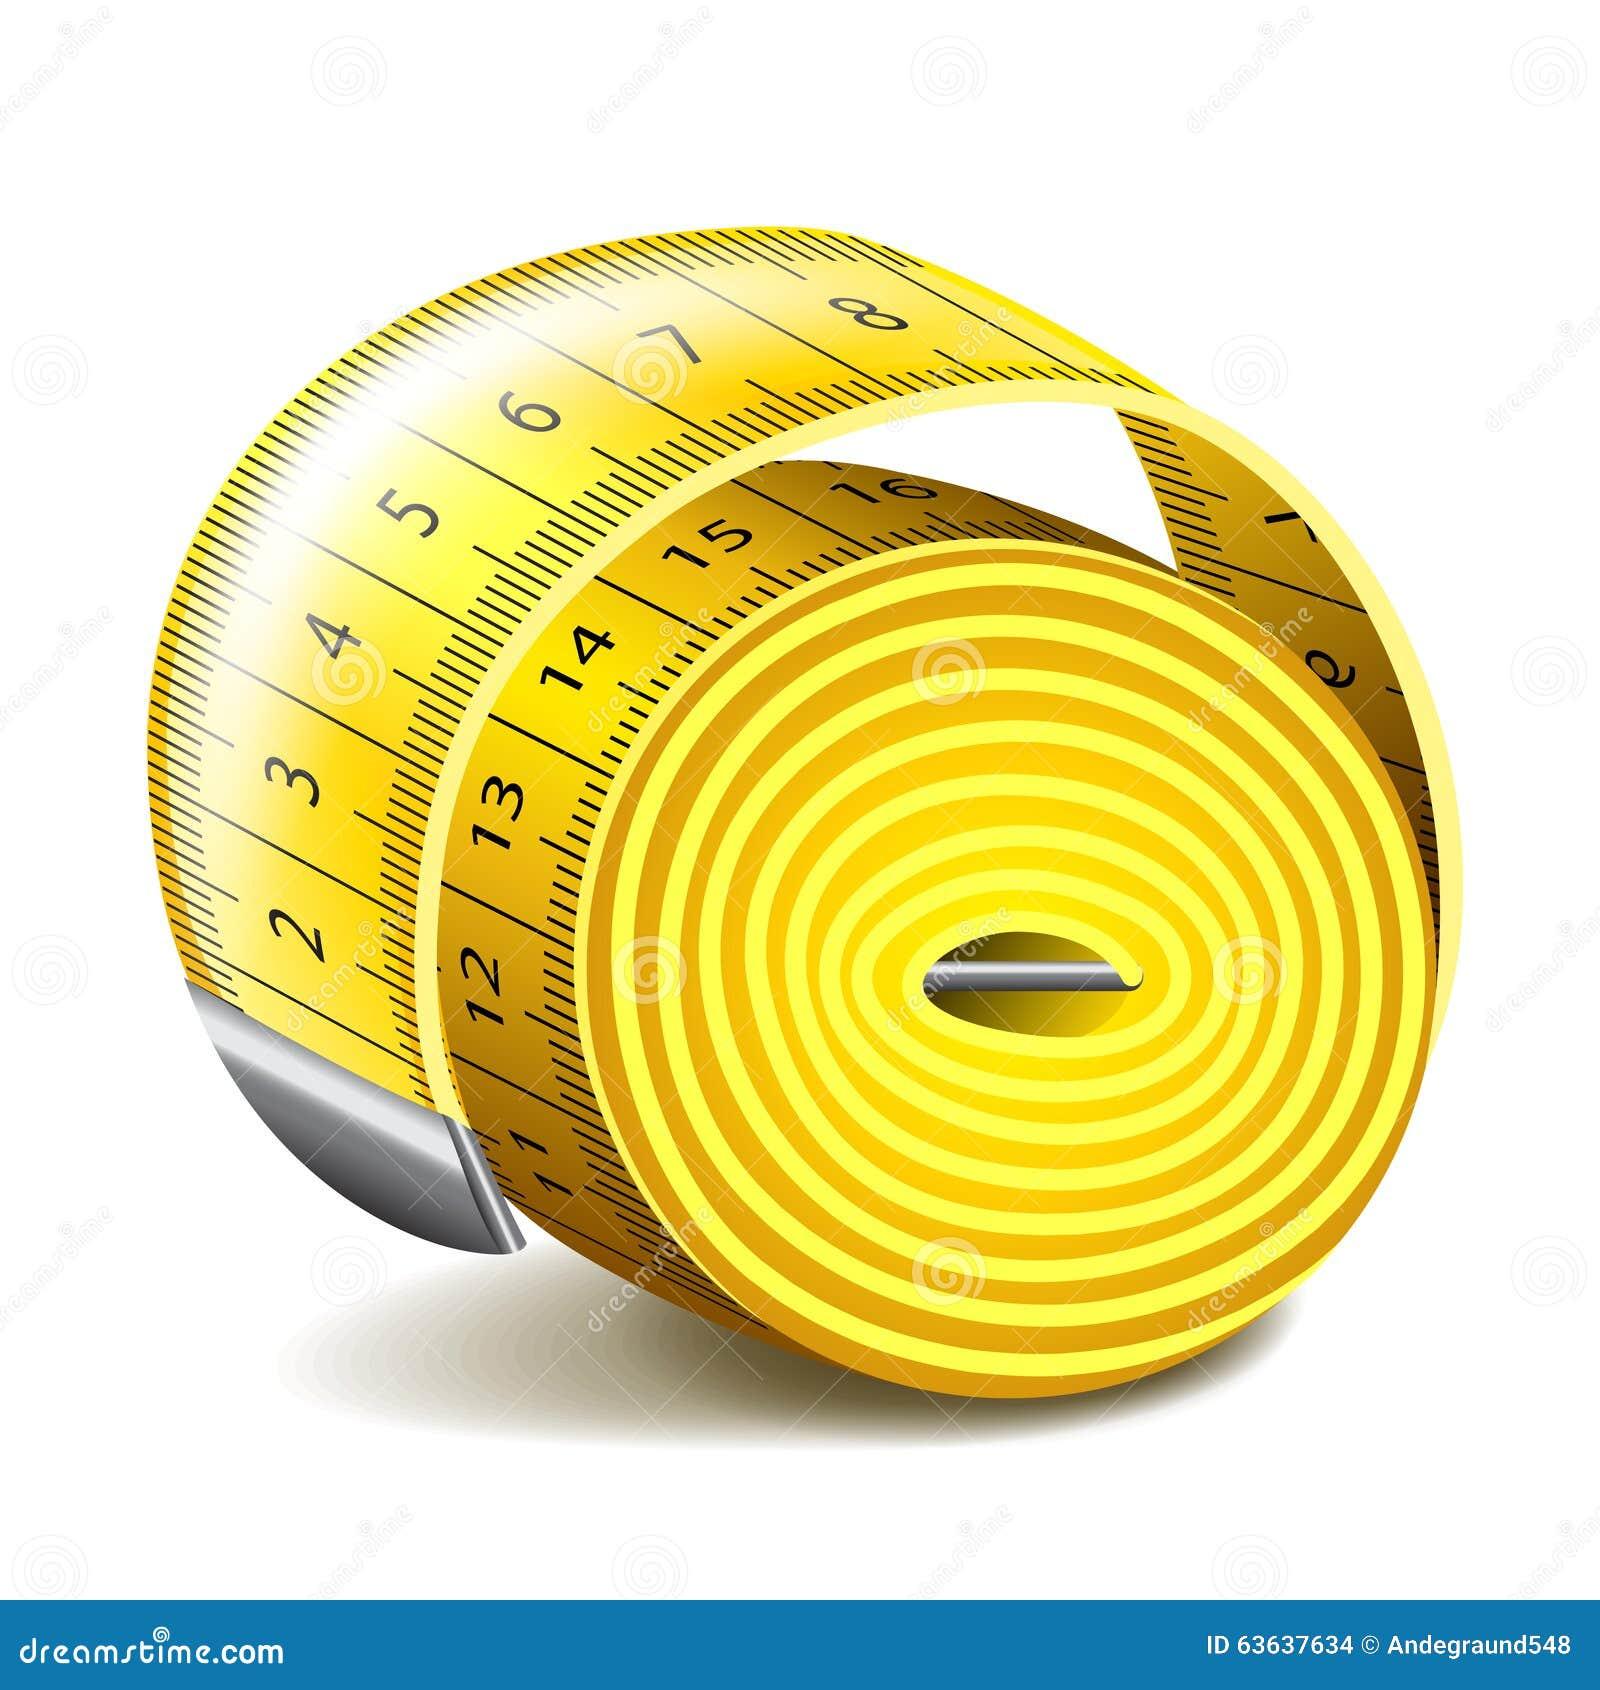 Measuring Tape On White Vector Stock Vector - Image: 63637634